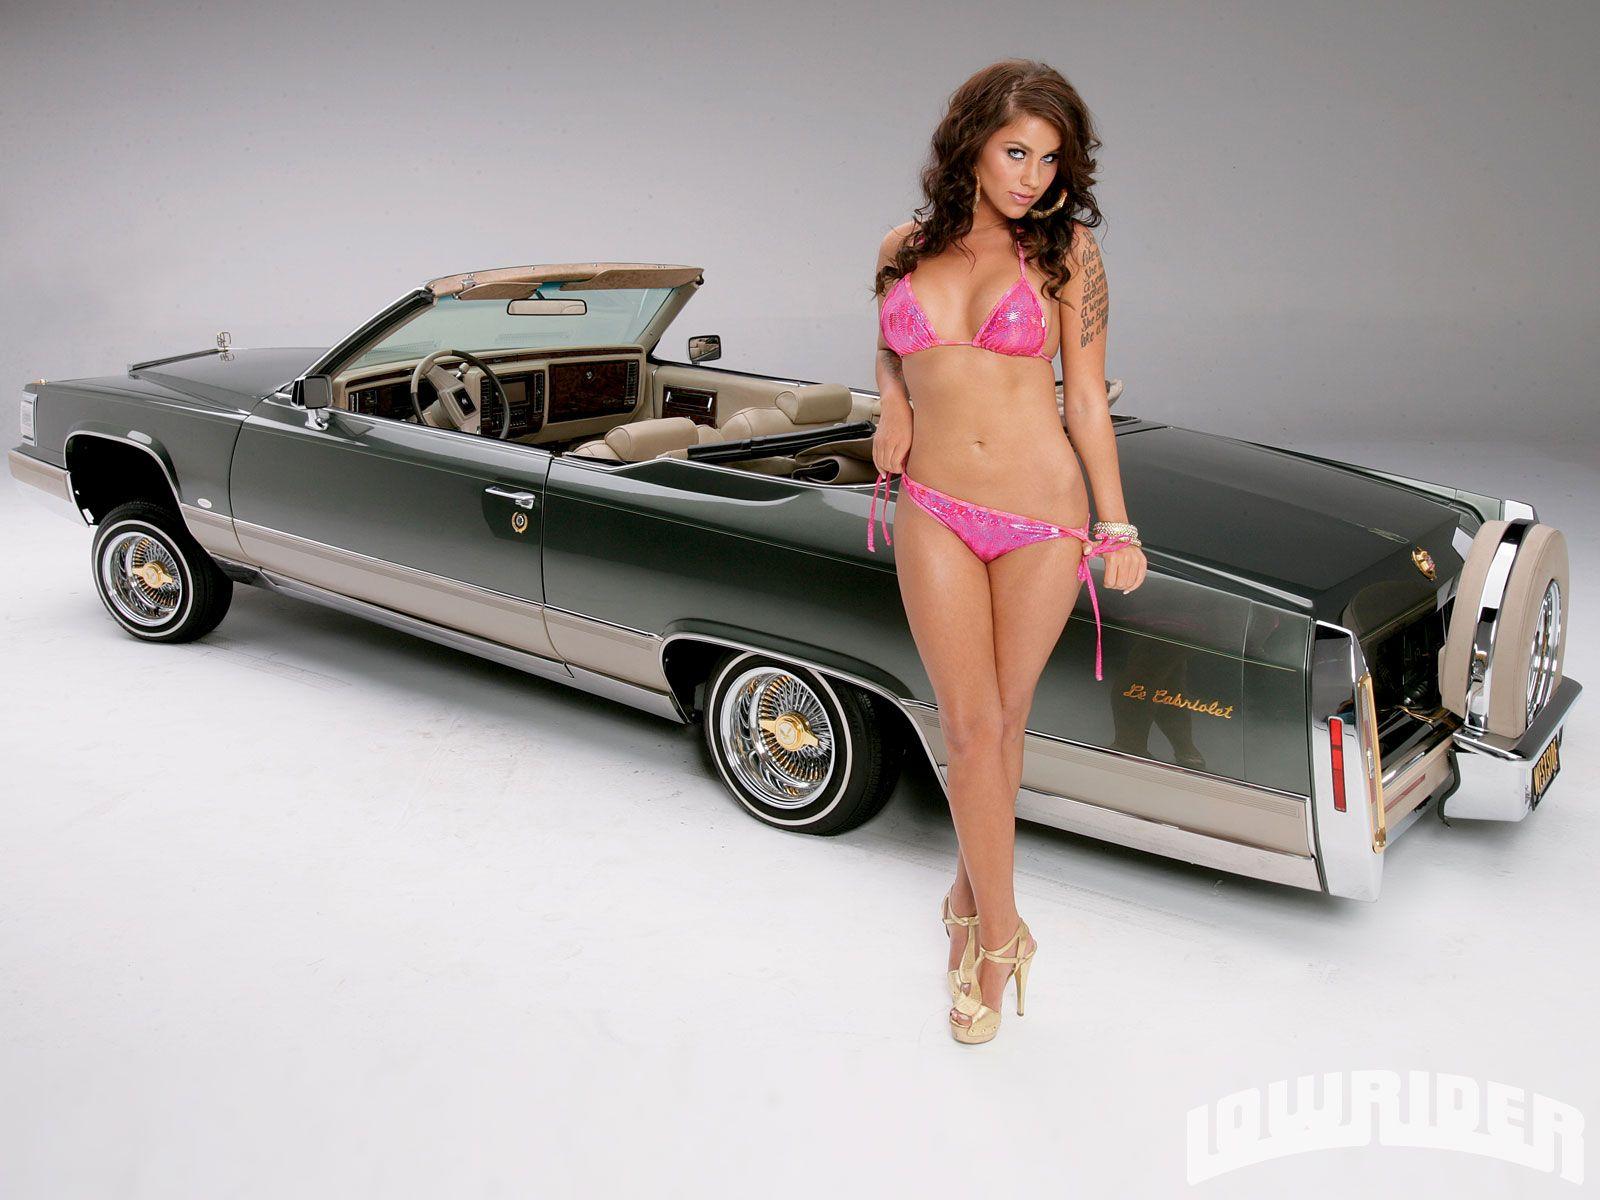 Free Download High quality Girls & Cars Wallpaper Num. 10 : 1600 x 1200 212.3 Kb